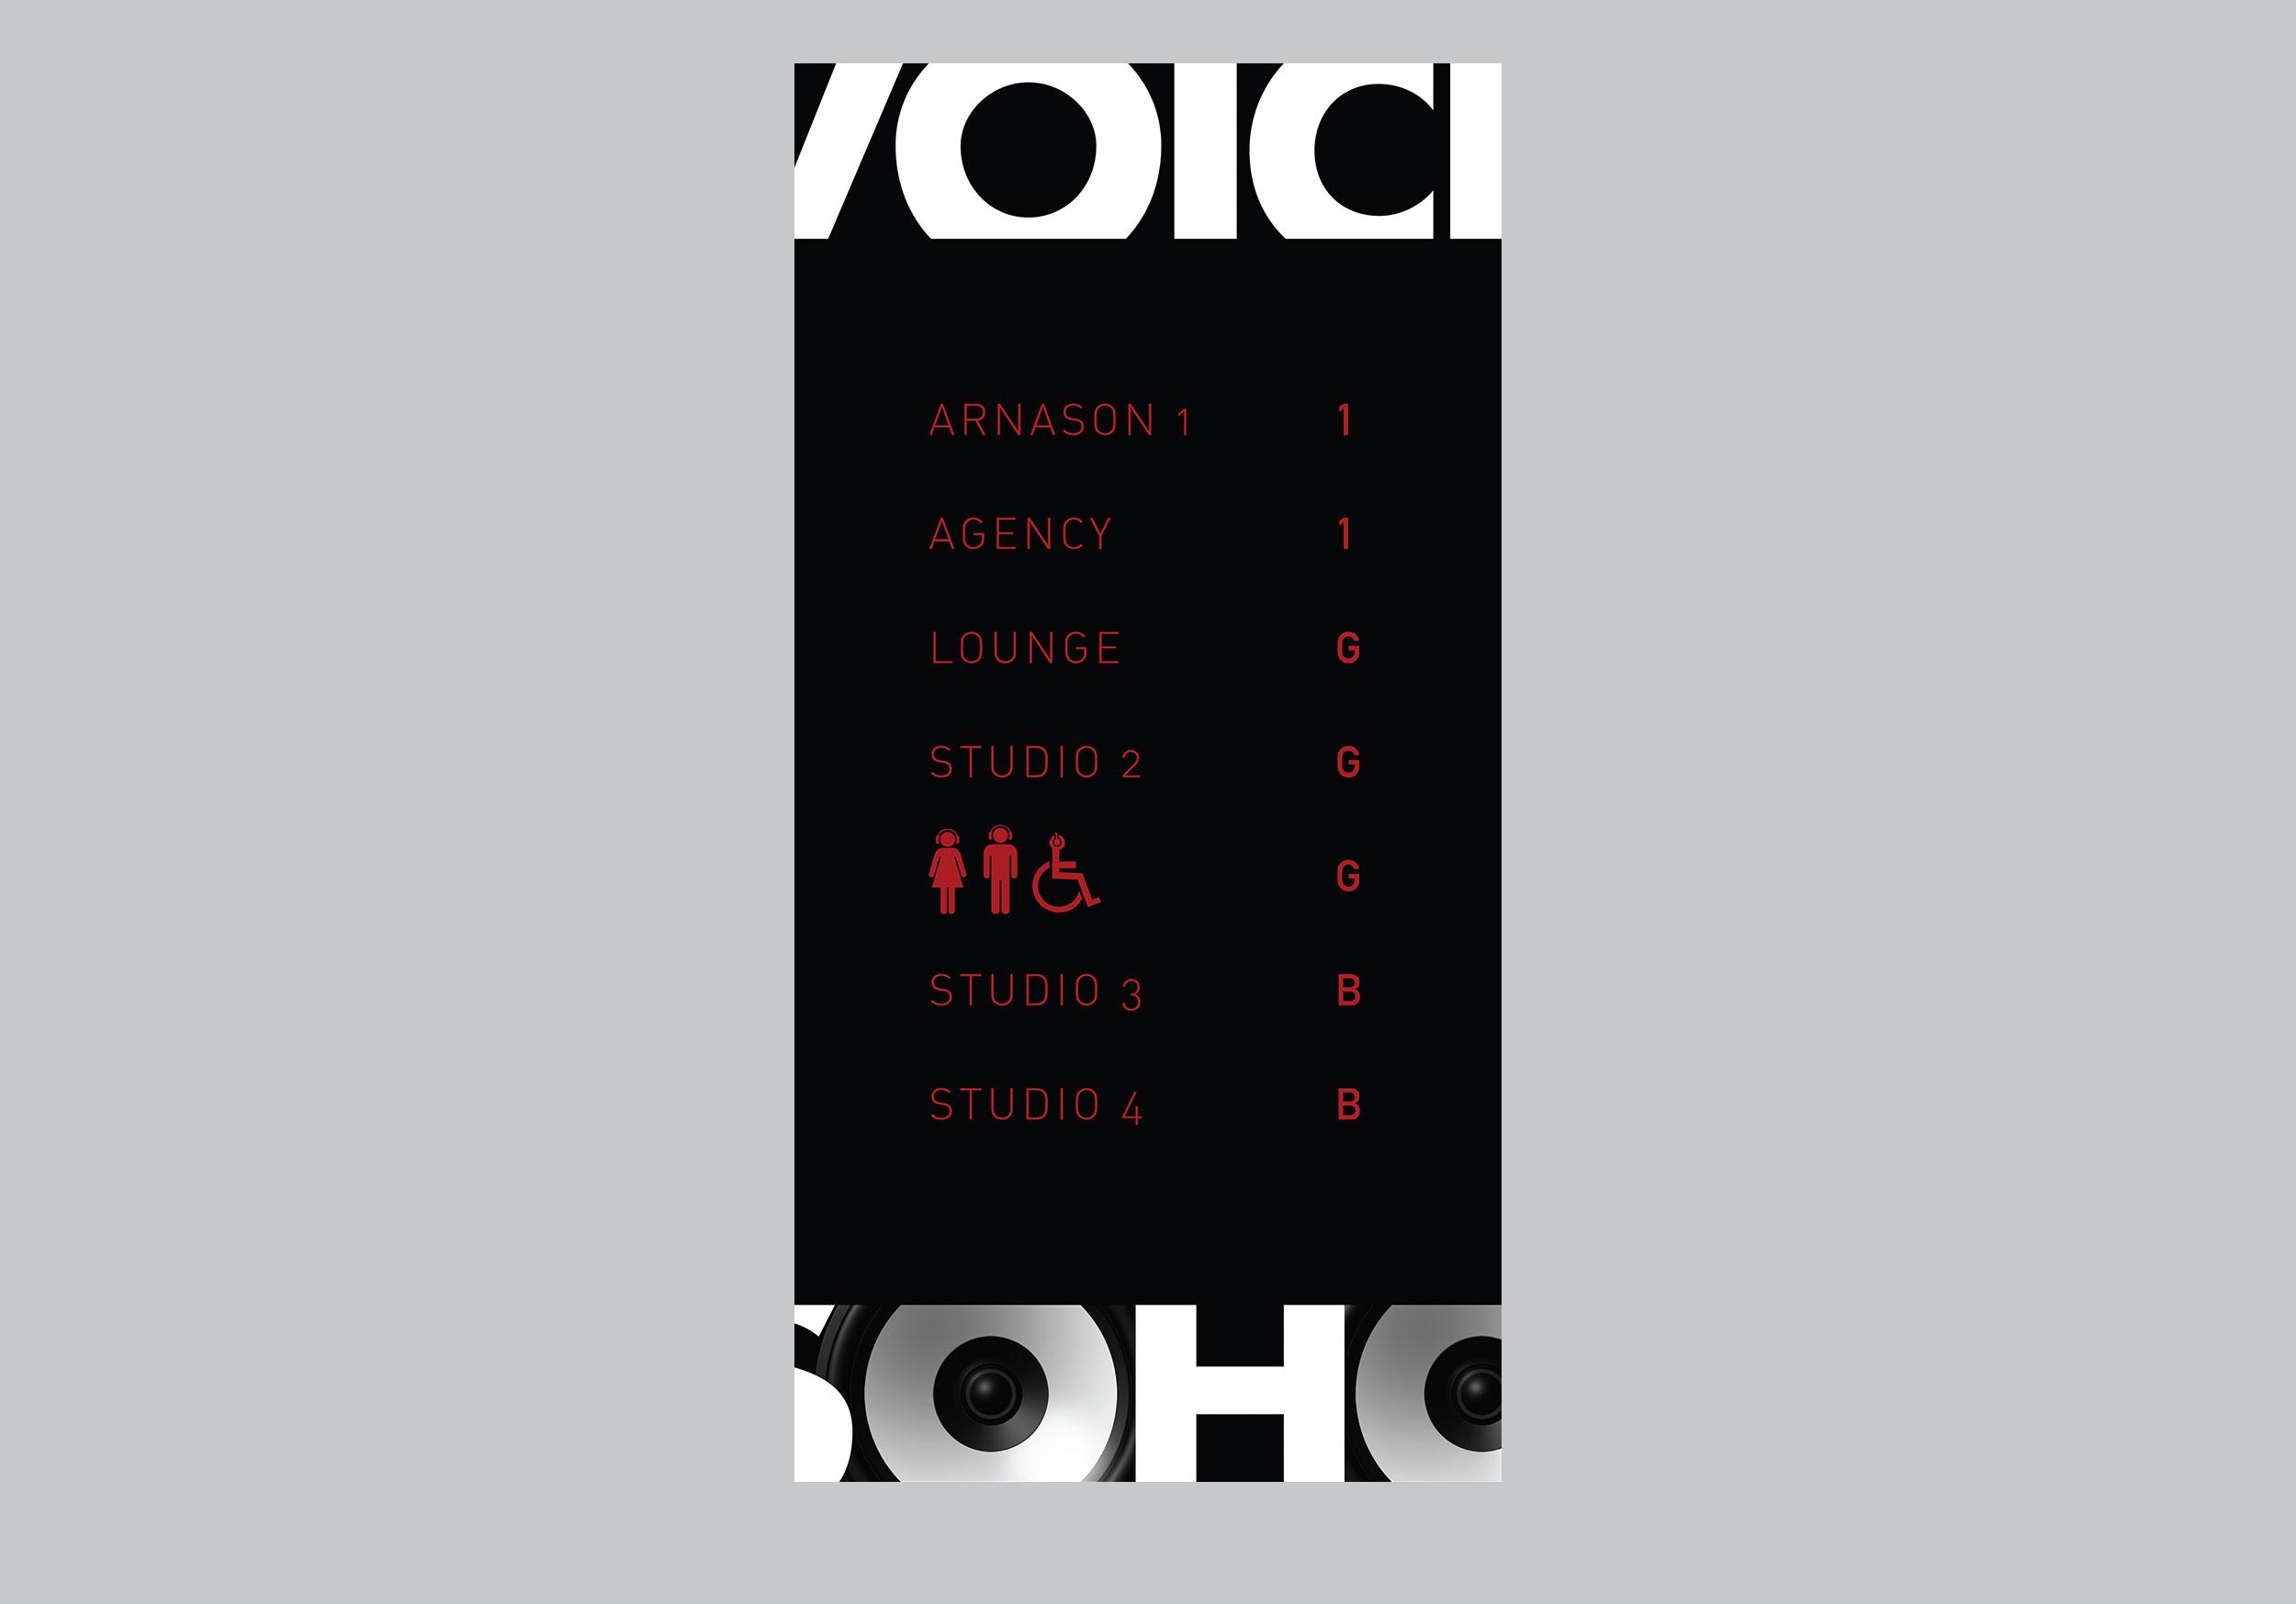 We are Noisy - Voiceover Soho - 05-Signage2